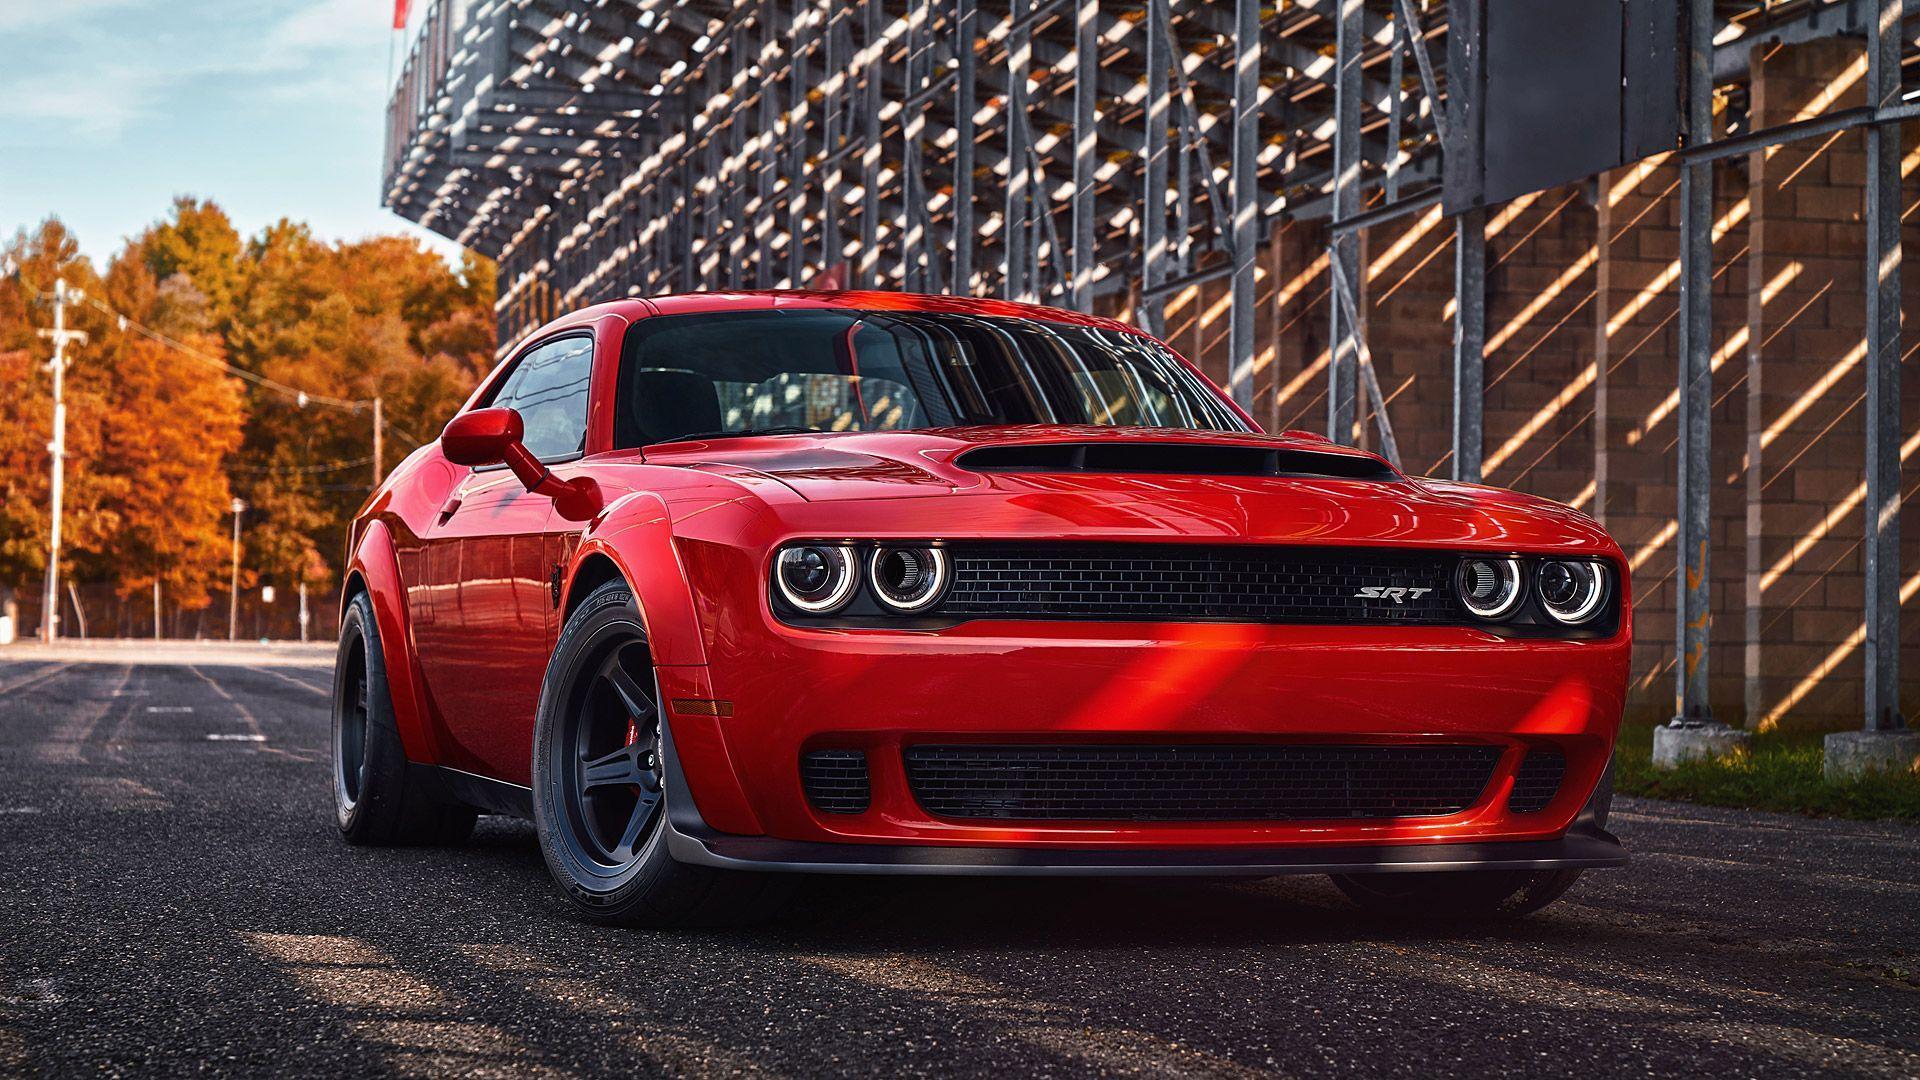 Dodge Challenger Wallpapers Top Free Dodge Challenger Backgrounds Wallpaperaccess